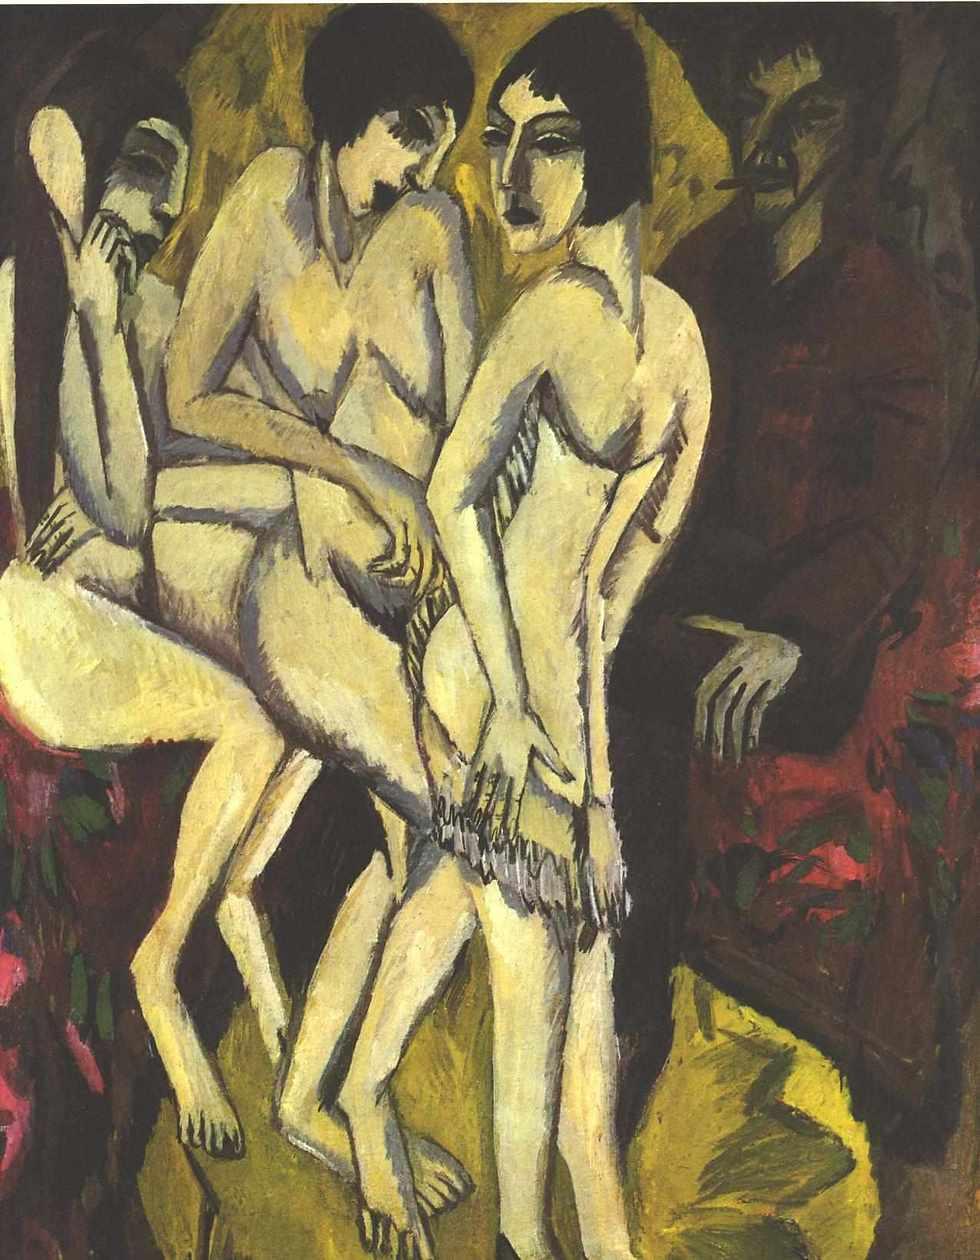 Kirchner's Judgment of Paris